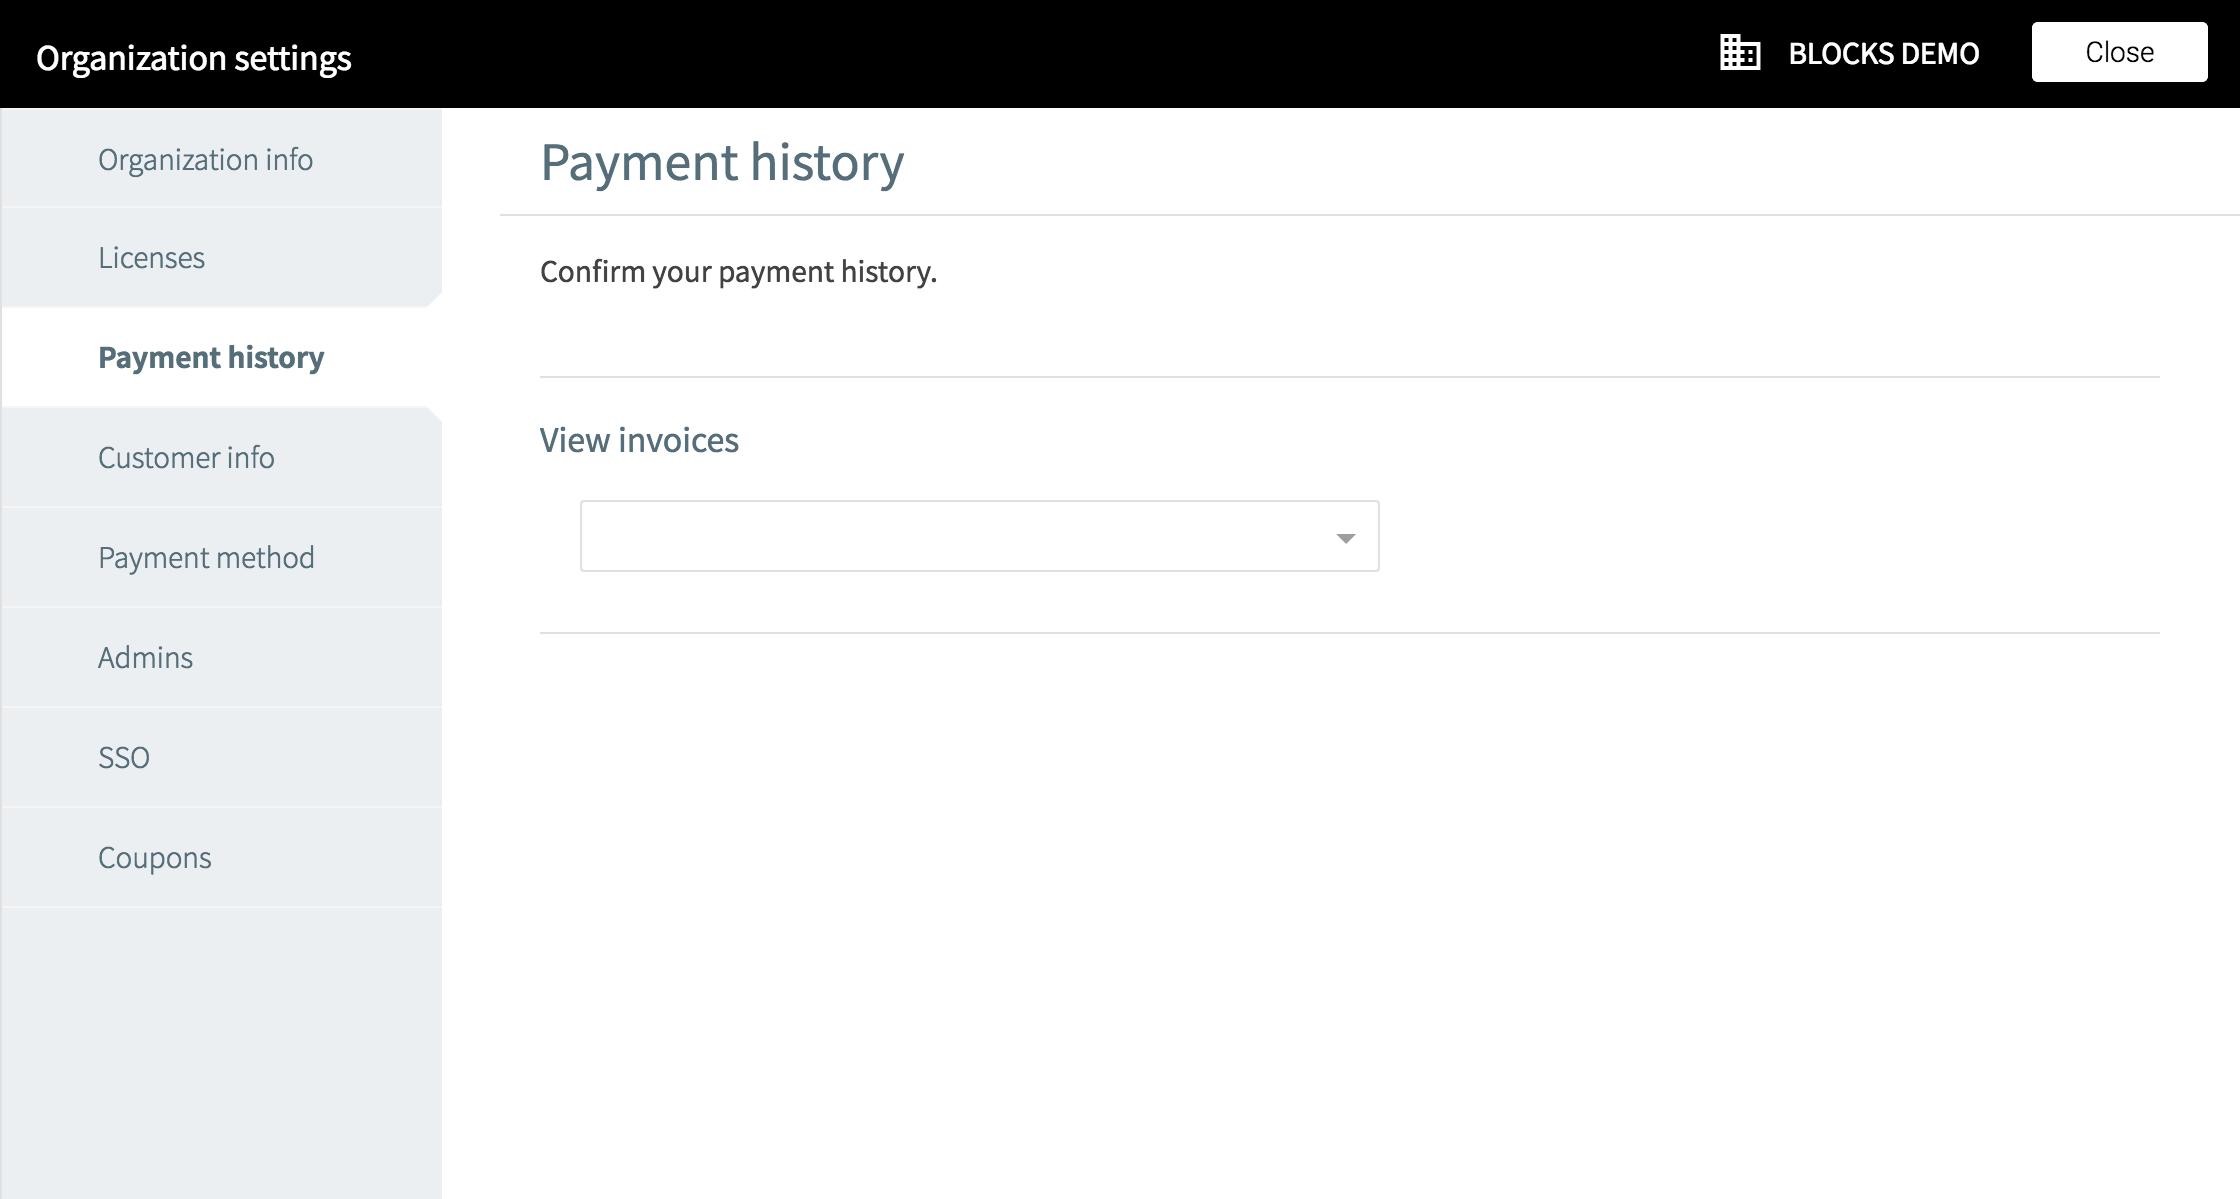 Organization setting payment history screen